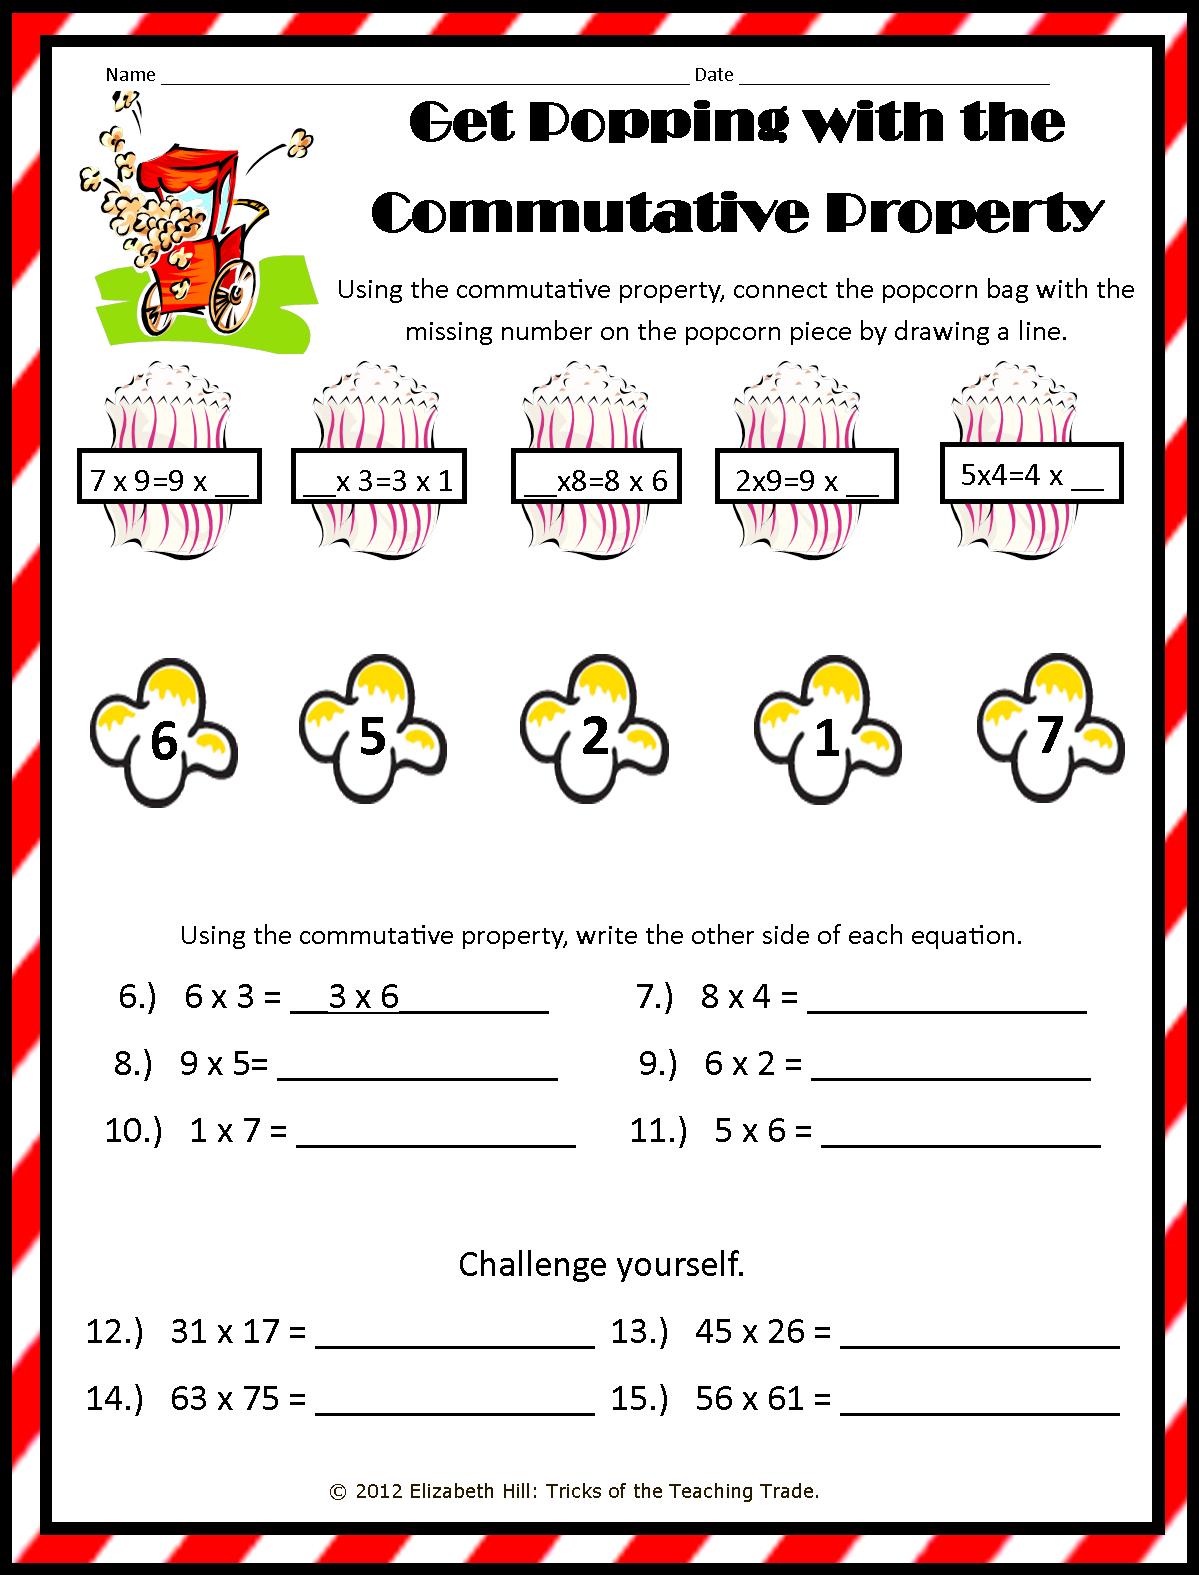 Commutative Property Multiplication Worksheets  Cmediadrivers Inside Commutative Property Of Multiplication Worksheets Pdf